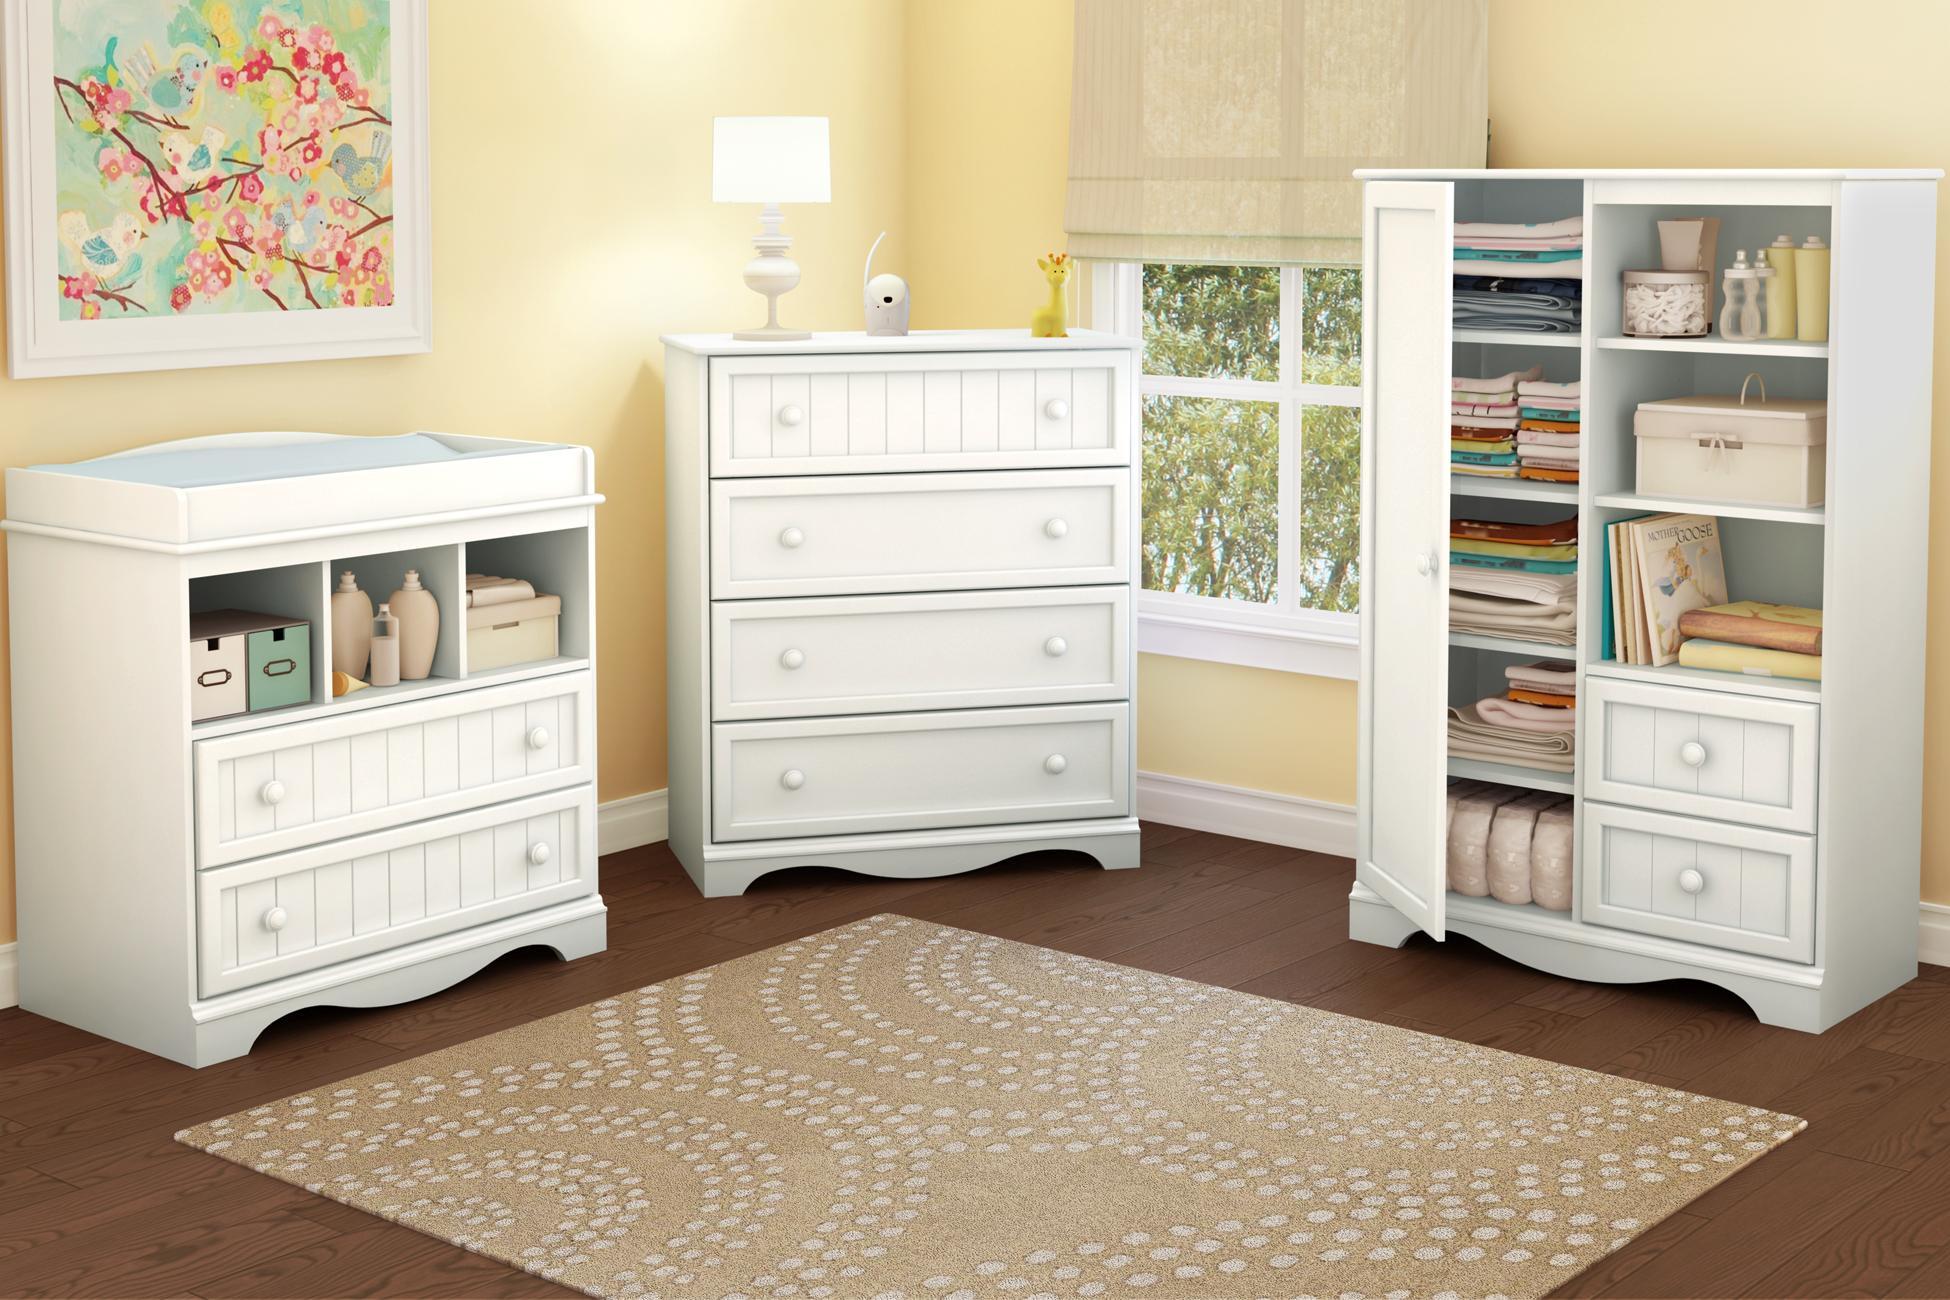 South shore furniture south shore savannah collection - South shore furniture bedroom sets ...